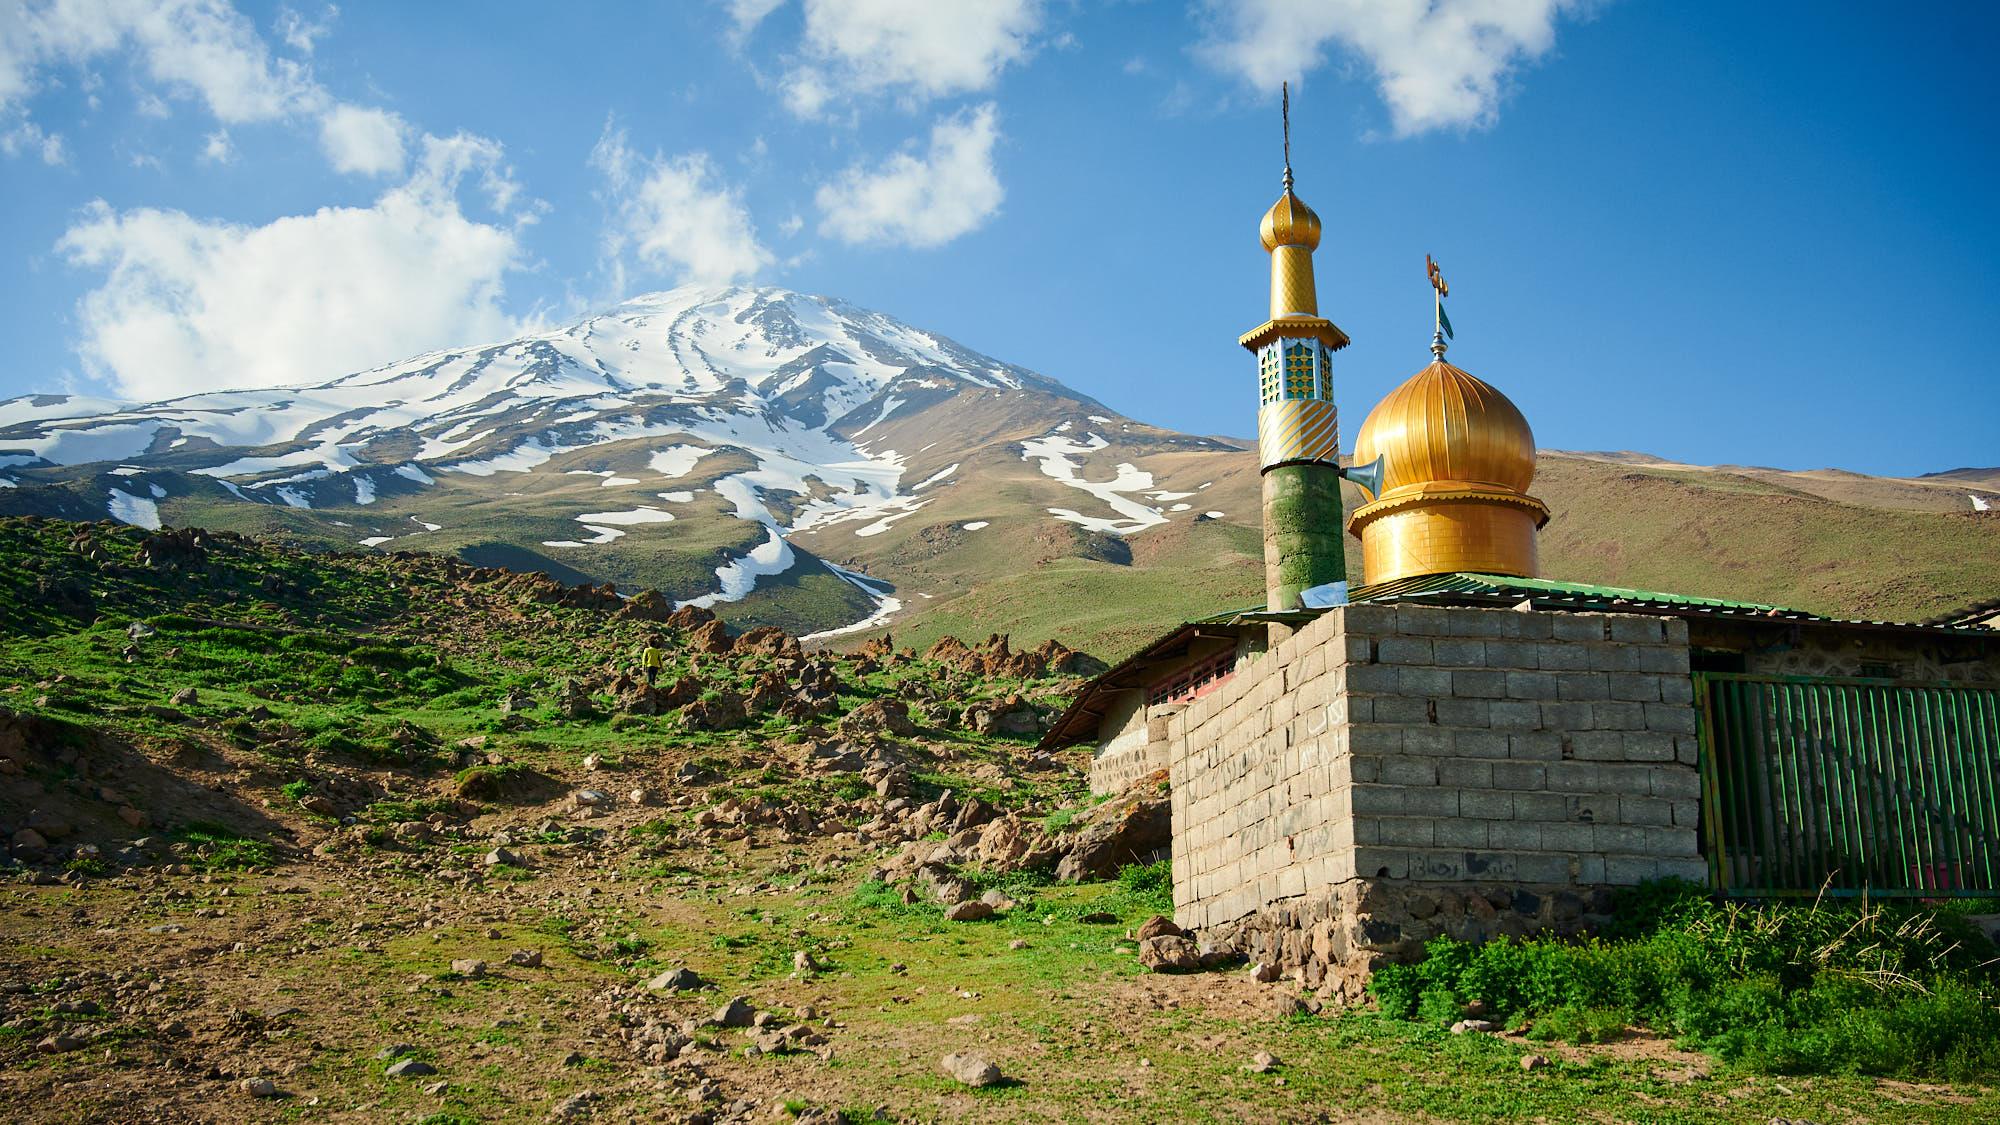 Former mosque in Mount Damavand base camp